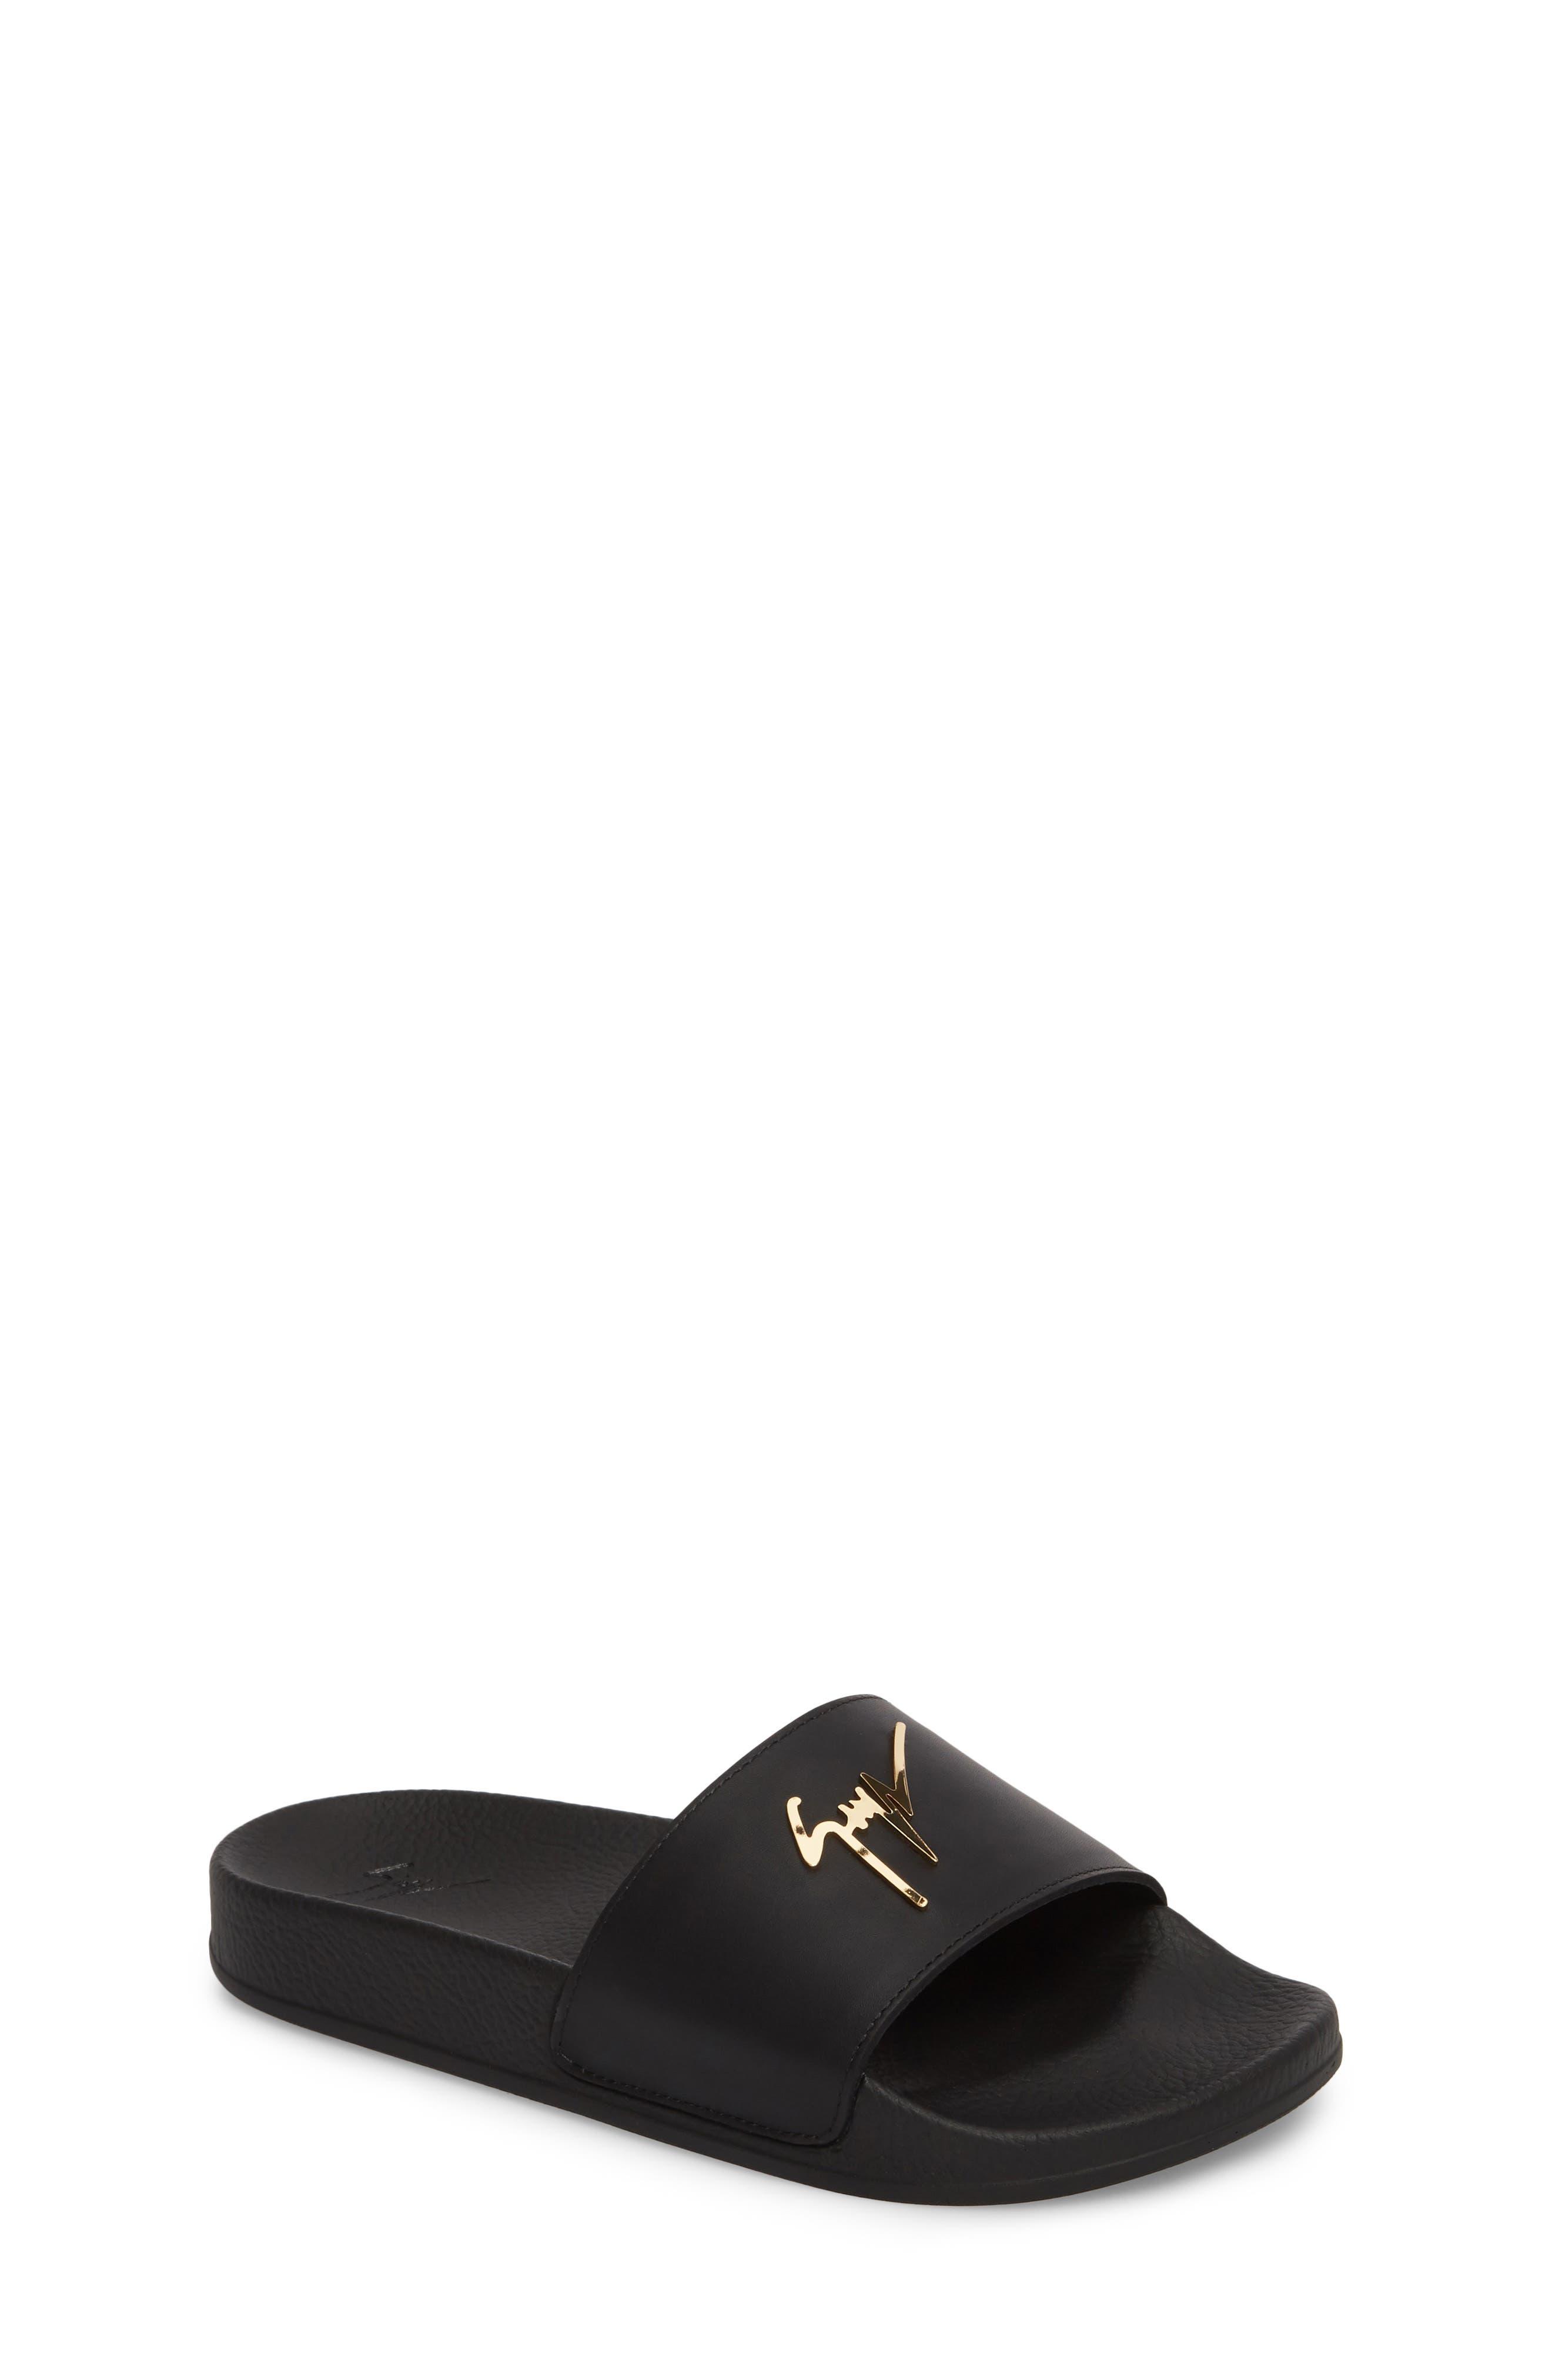 Birel Slide Sandal,                         Main,                         color, 001